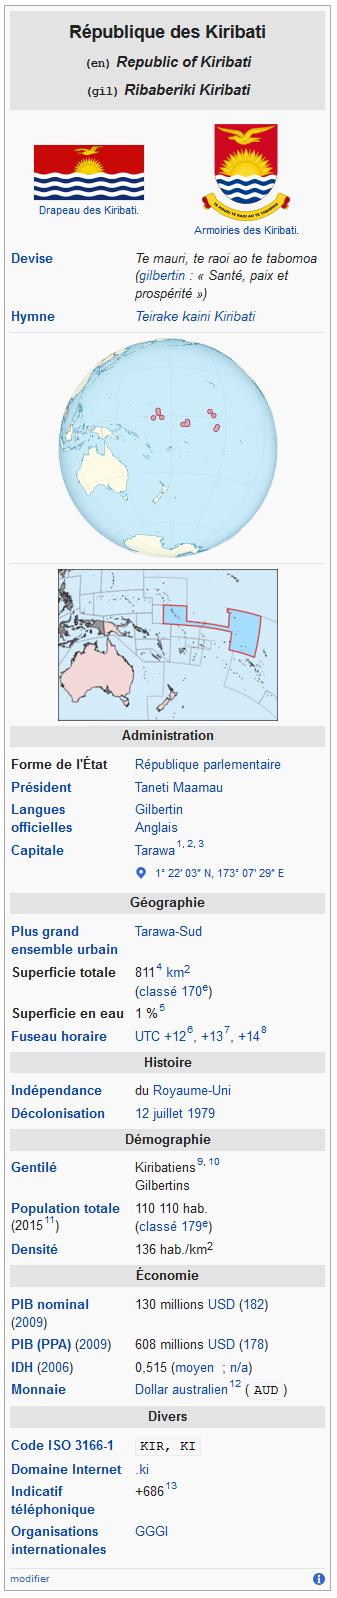 Screenshot_2020-06-02_Kiribati_—_Wikip